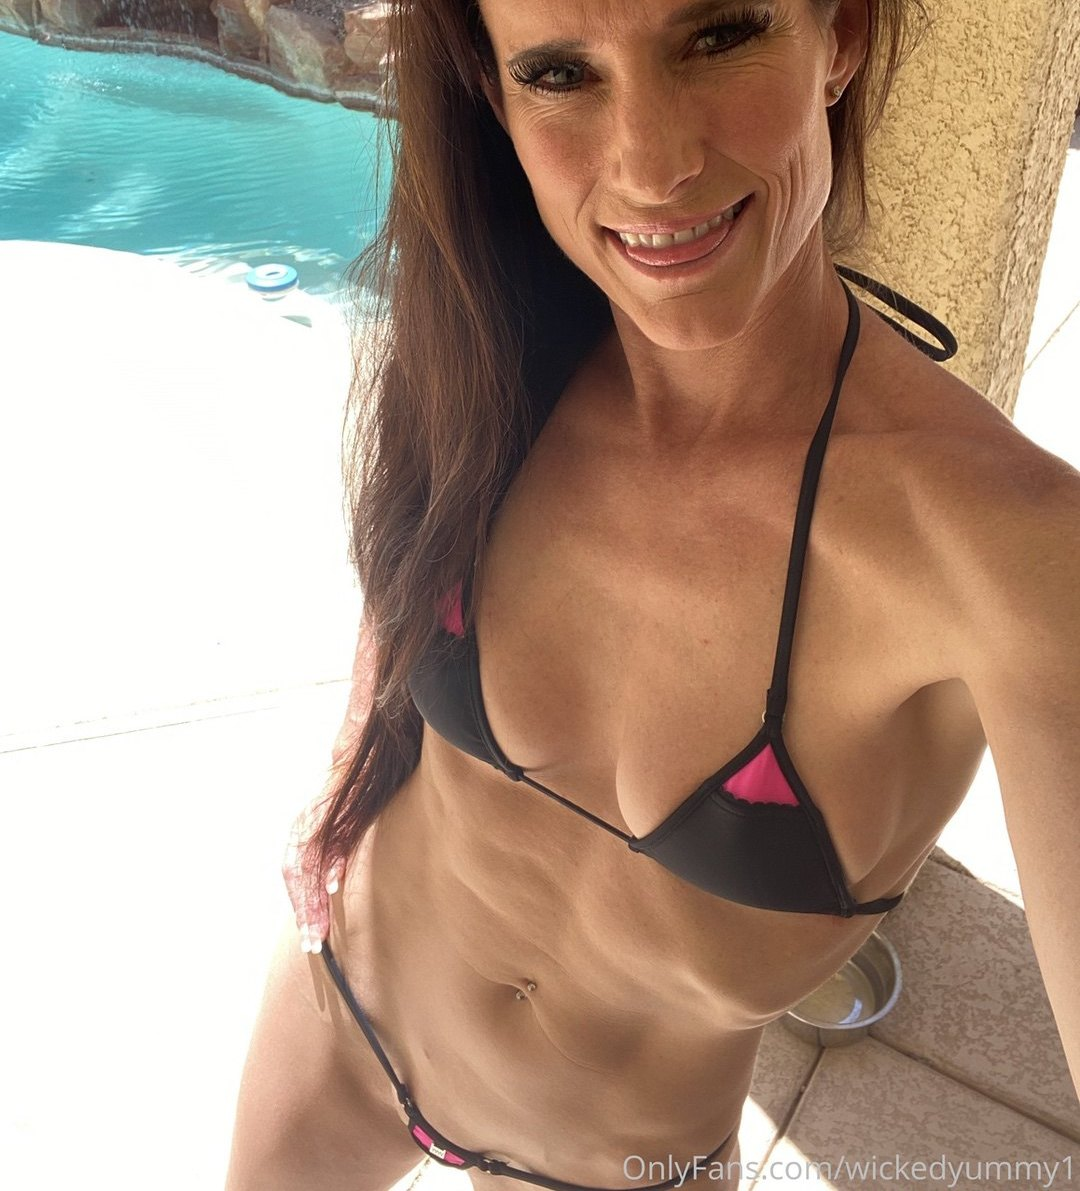 Sofie Marie Wickedyummy1 Onlyfans Nudes Leaks 0013